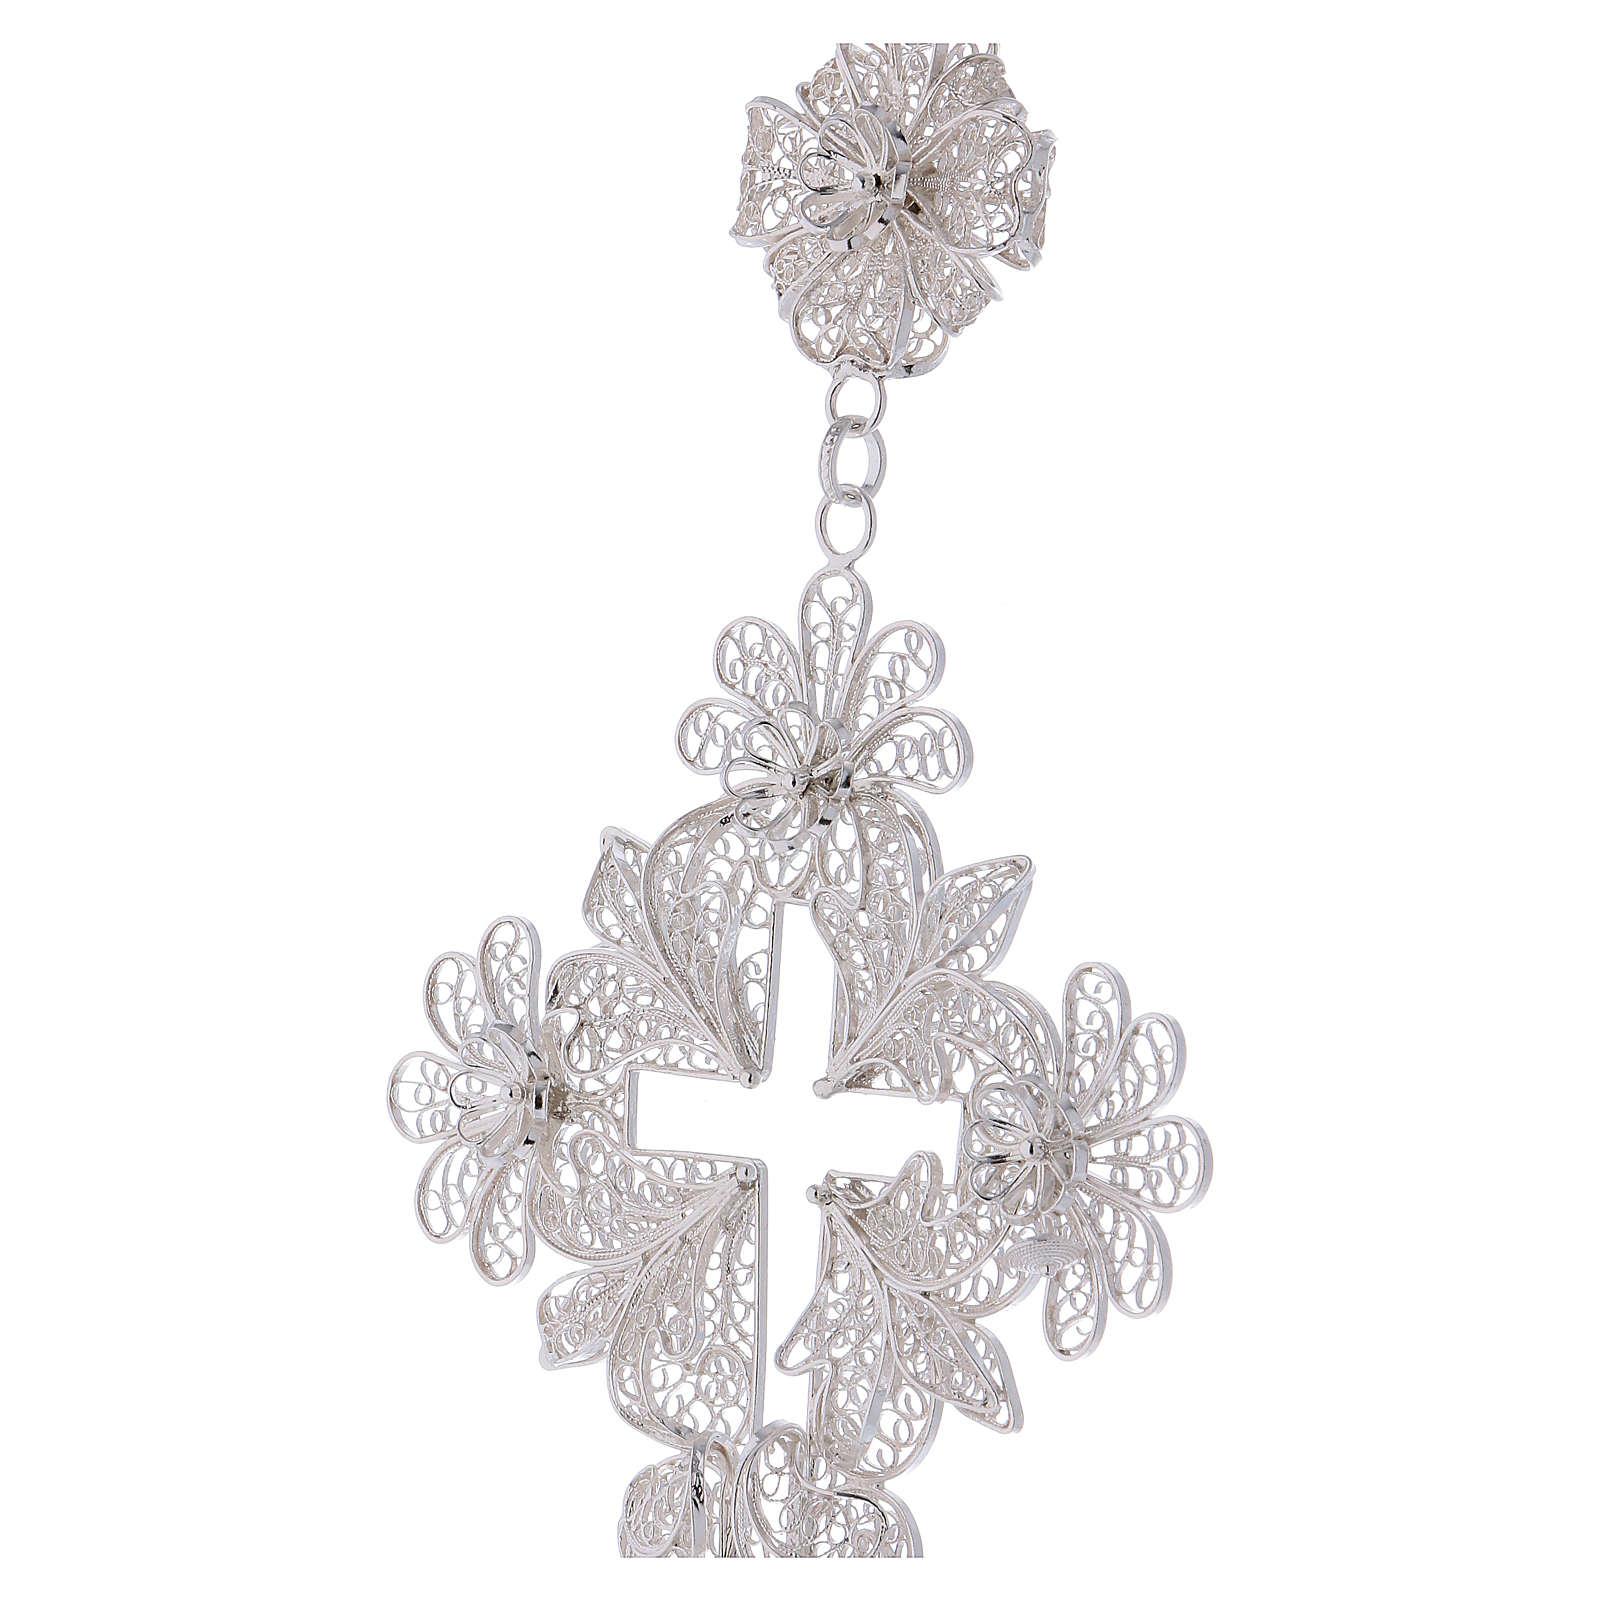 Pectoral Cross in silver 800 filigree 3